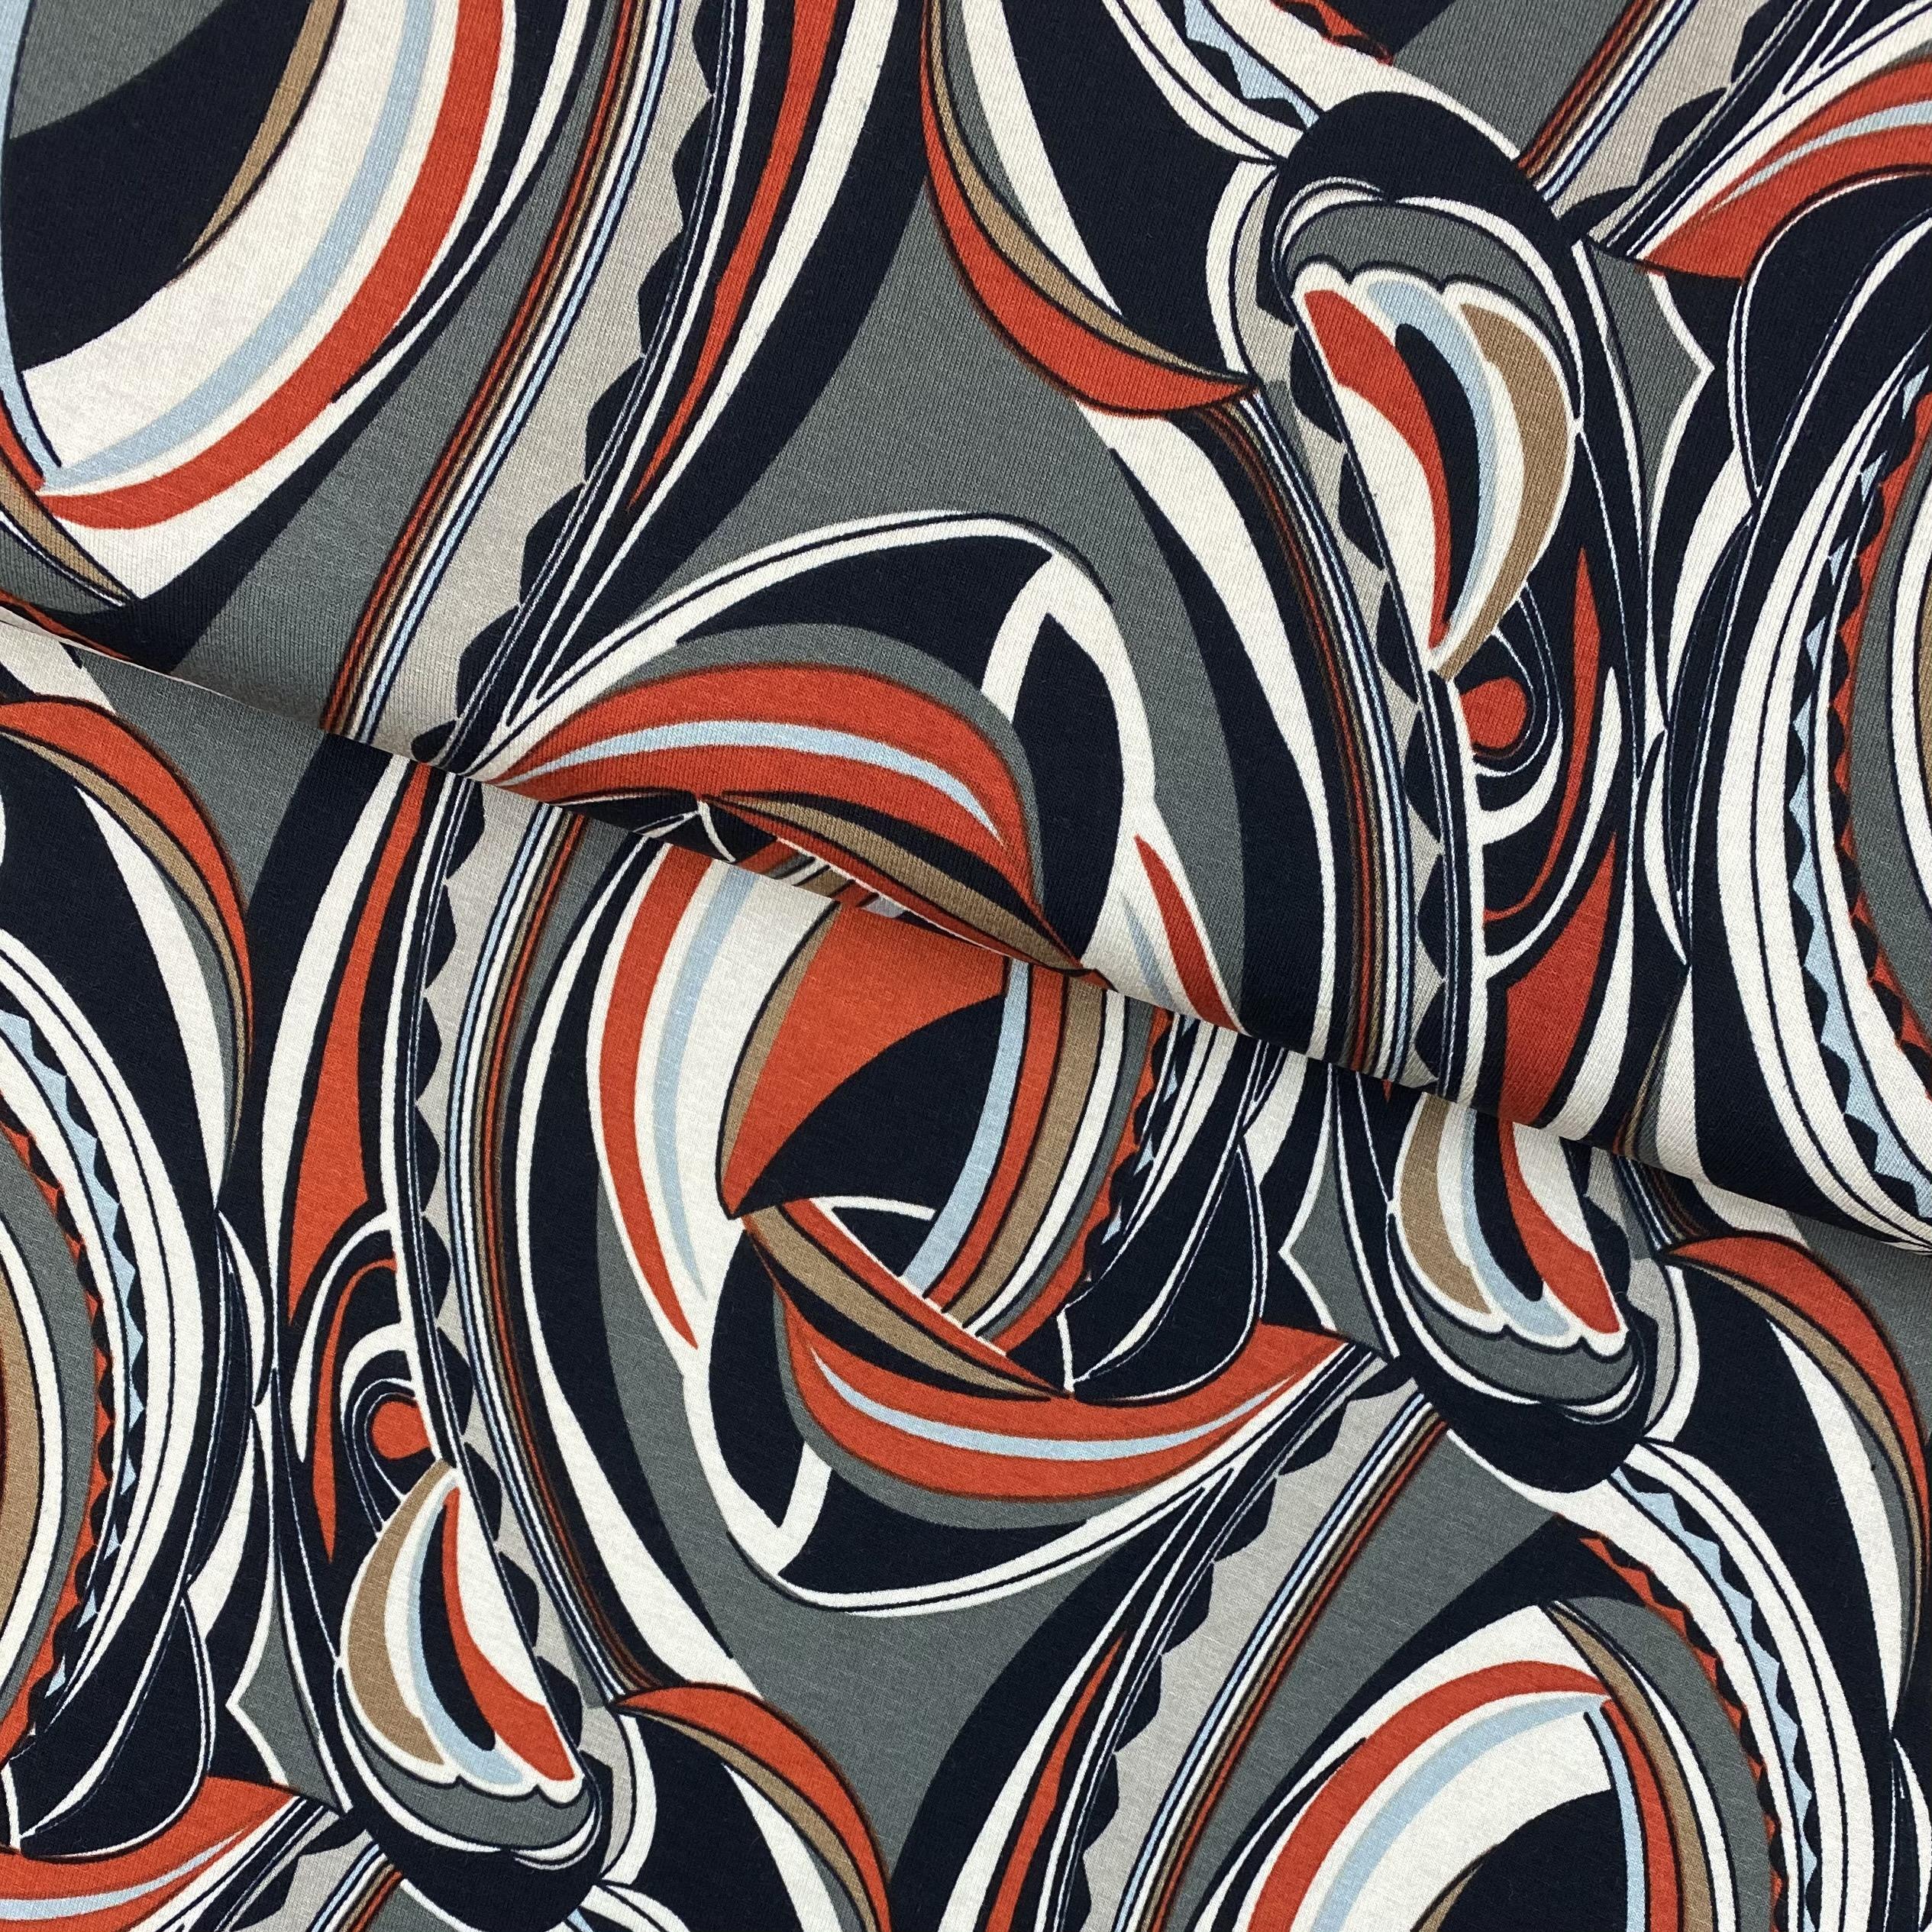 Viskosenjersey, Digital Druck, khaki. Art. PC1733-127